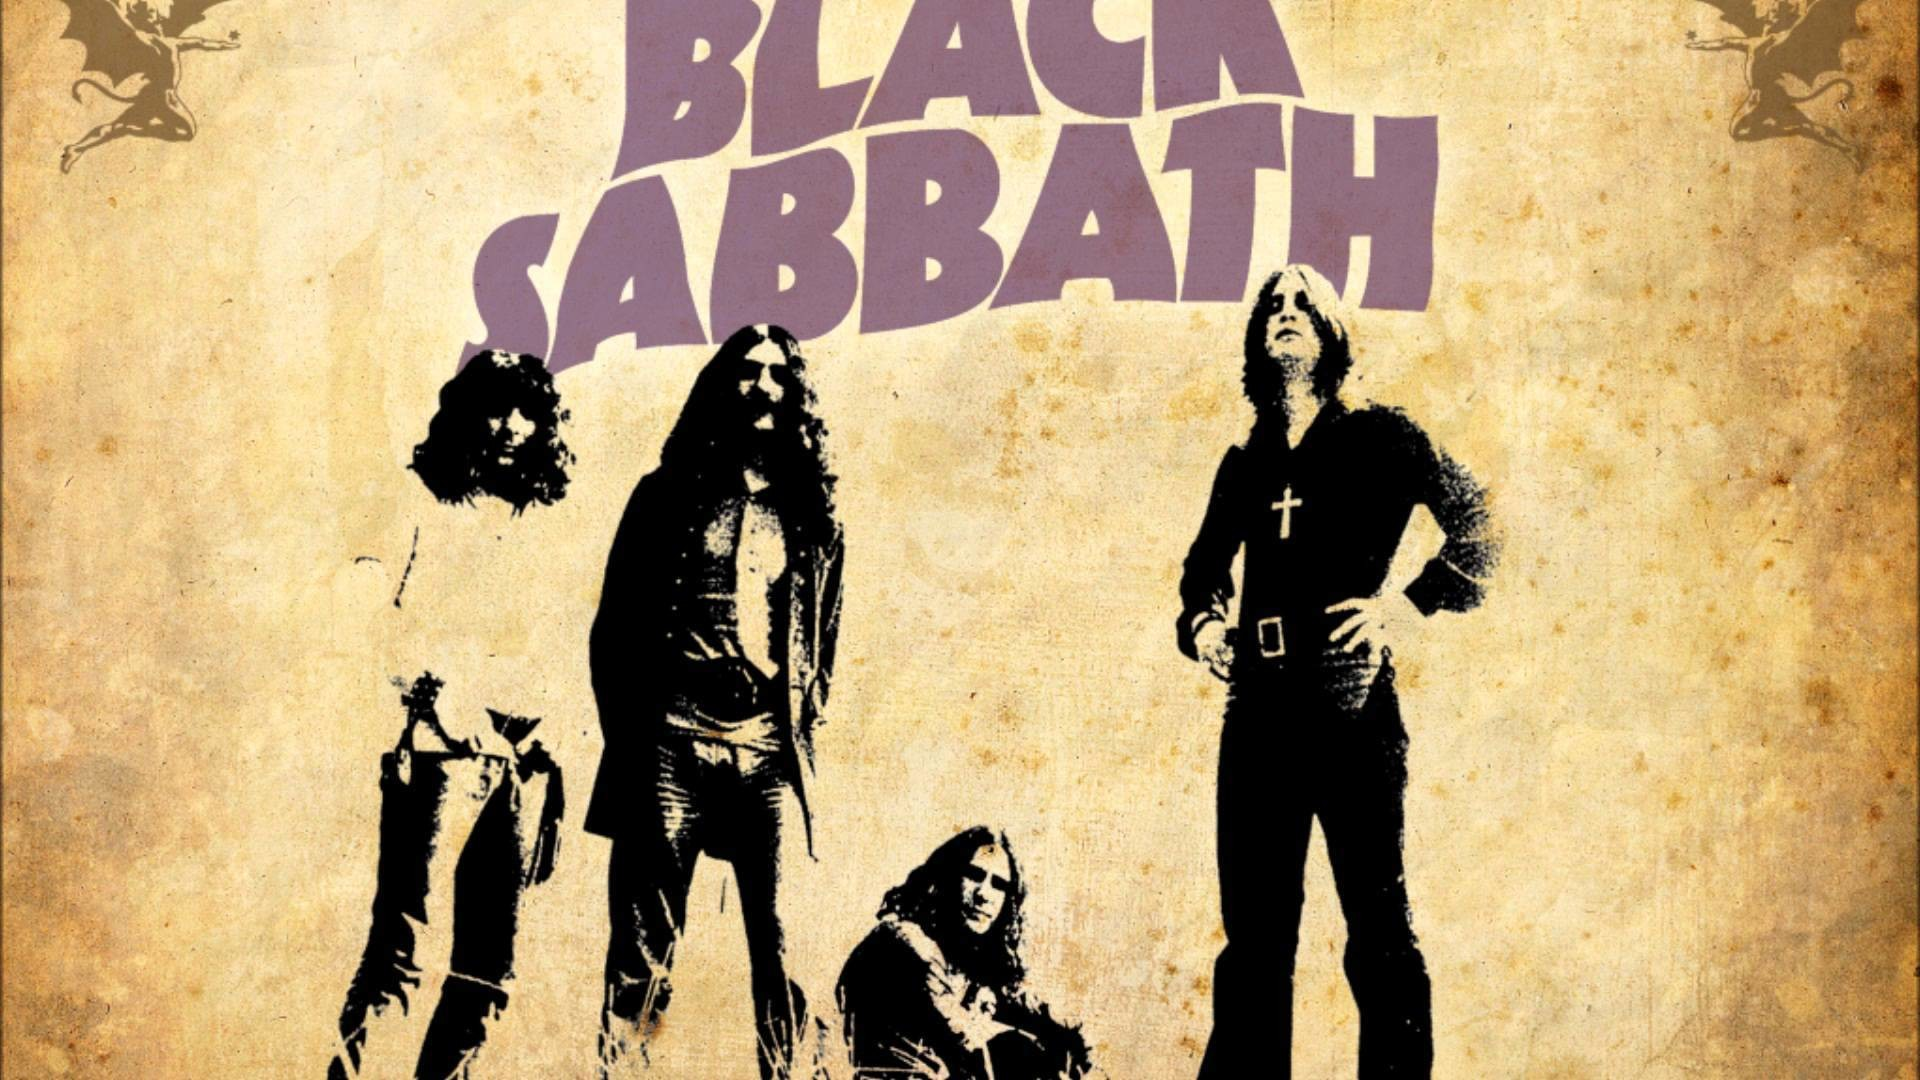 Black Sabbath Desktop